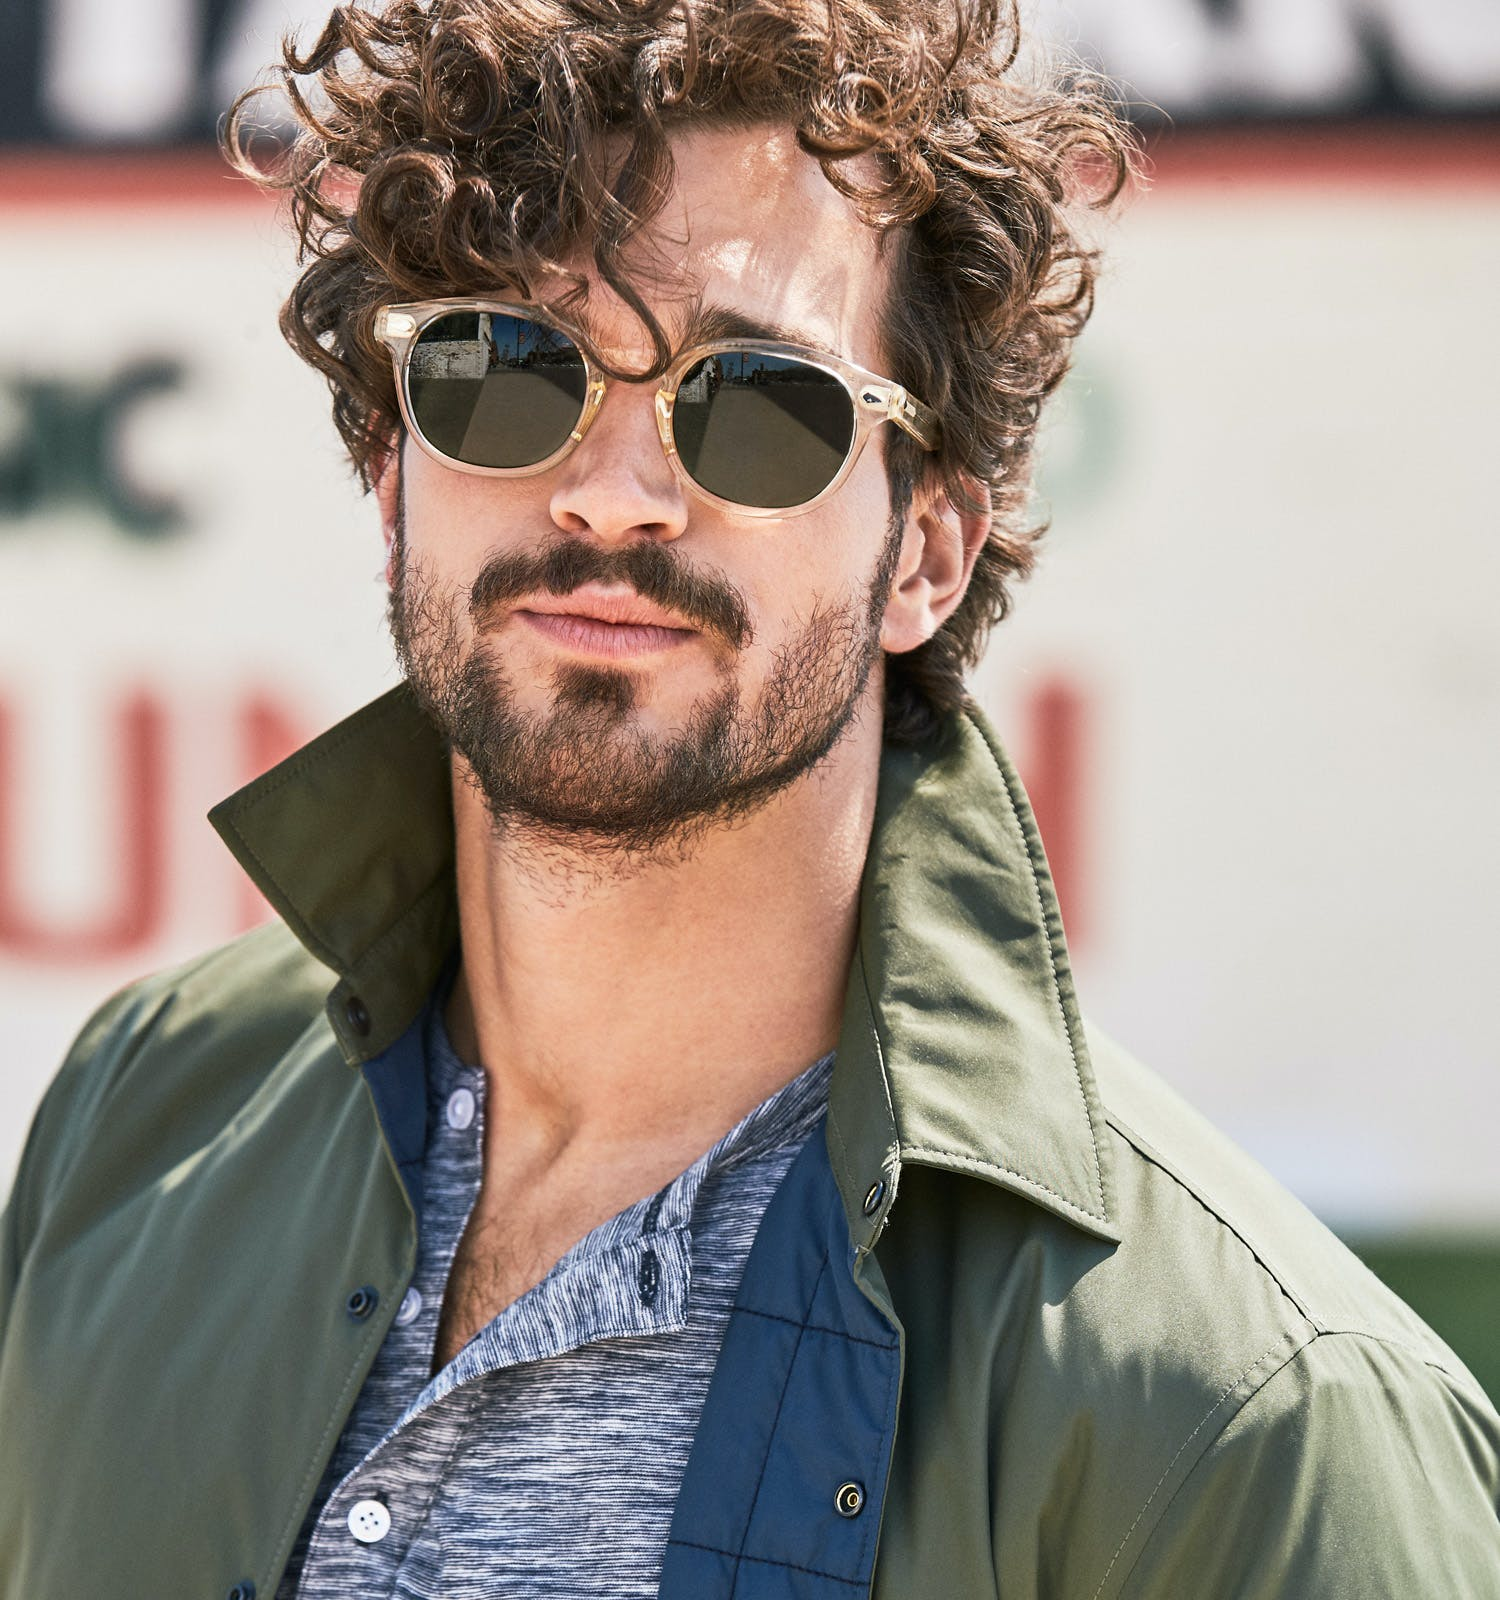 Photo of Man in Sunglasses